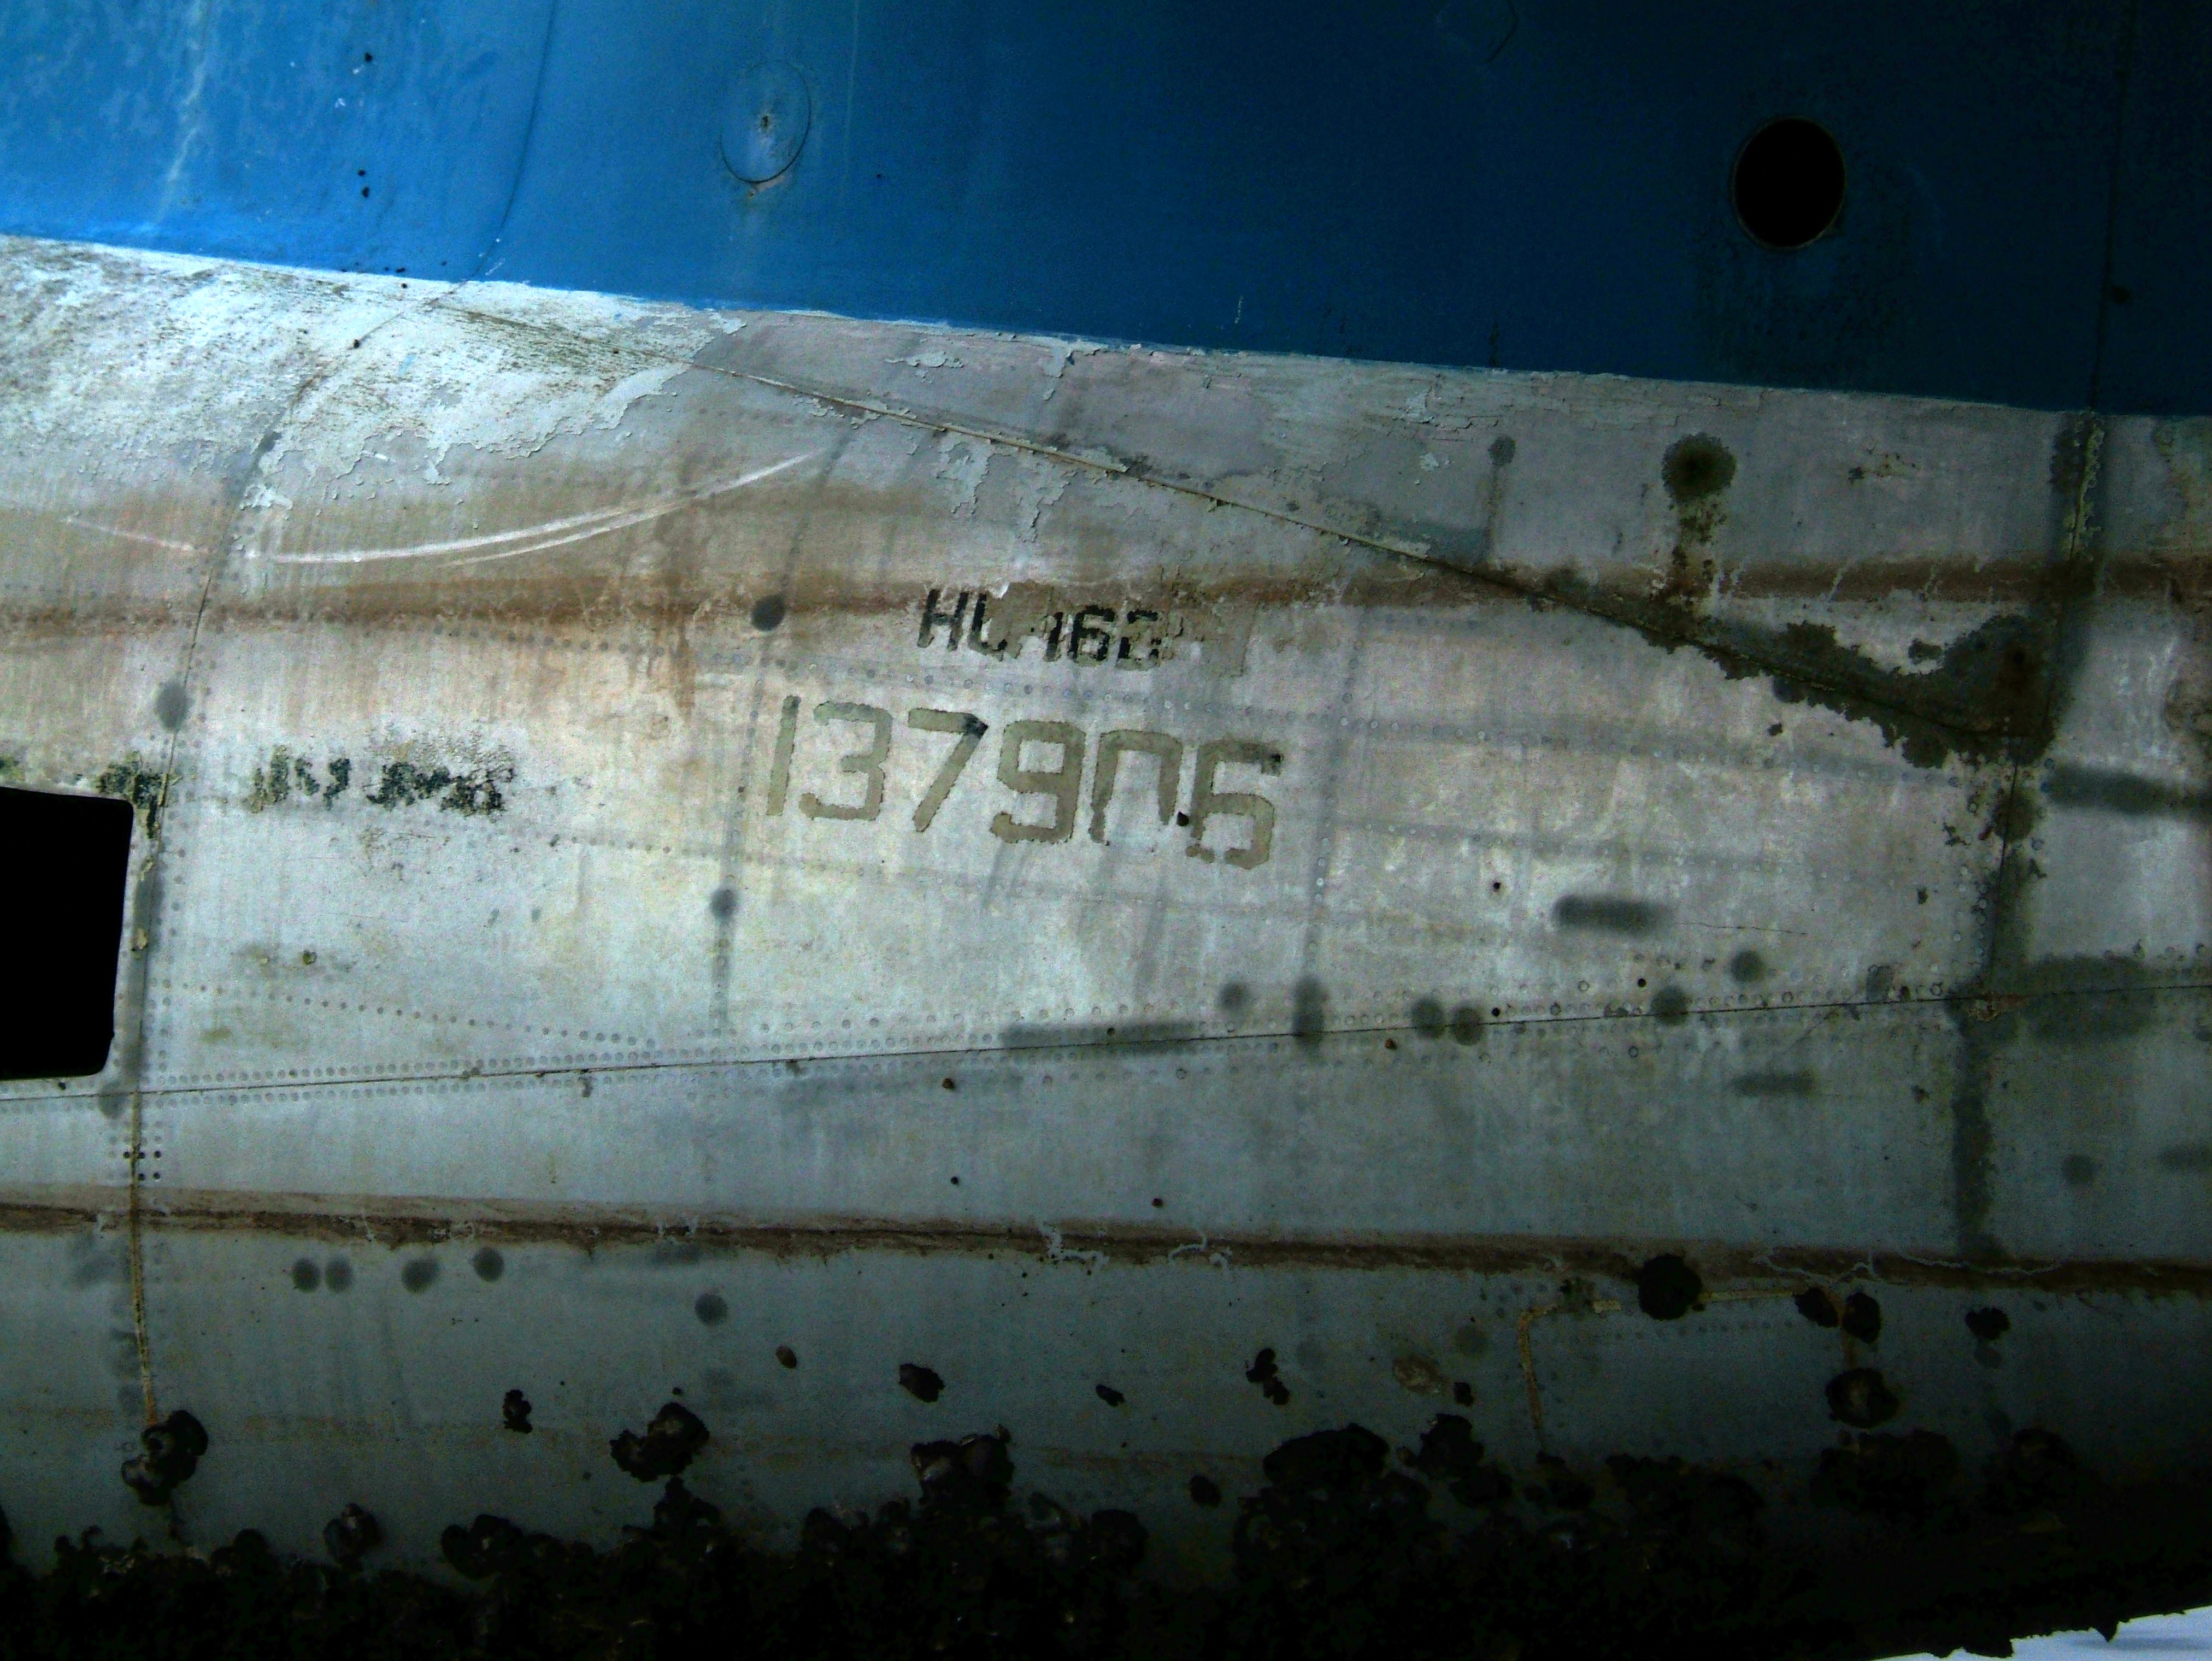 USN Bul No 137906 UF 1 Albatross Philippine AF Coron Bay July 2005 01